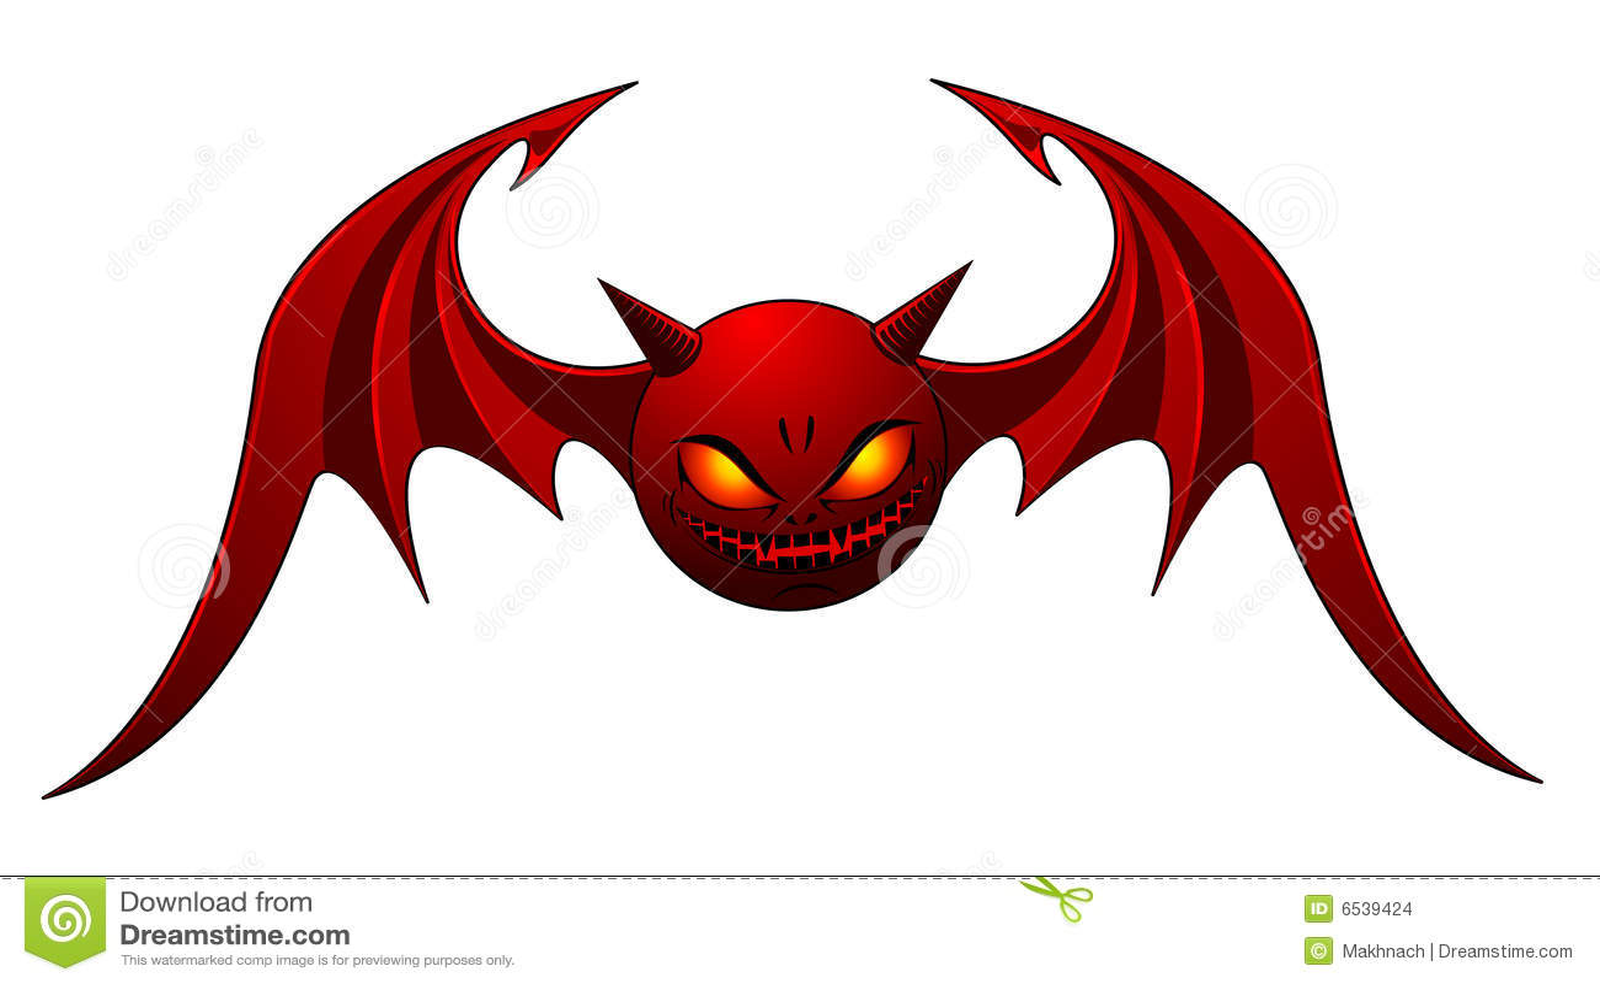 Evil Bat Stock Images - Image: 6539424